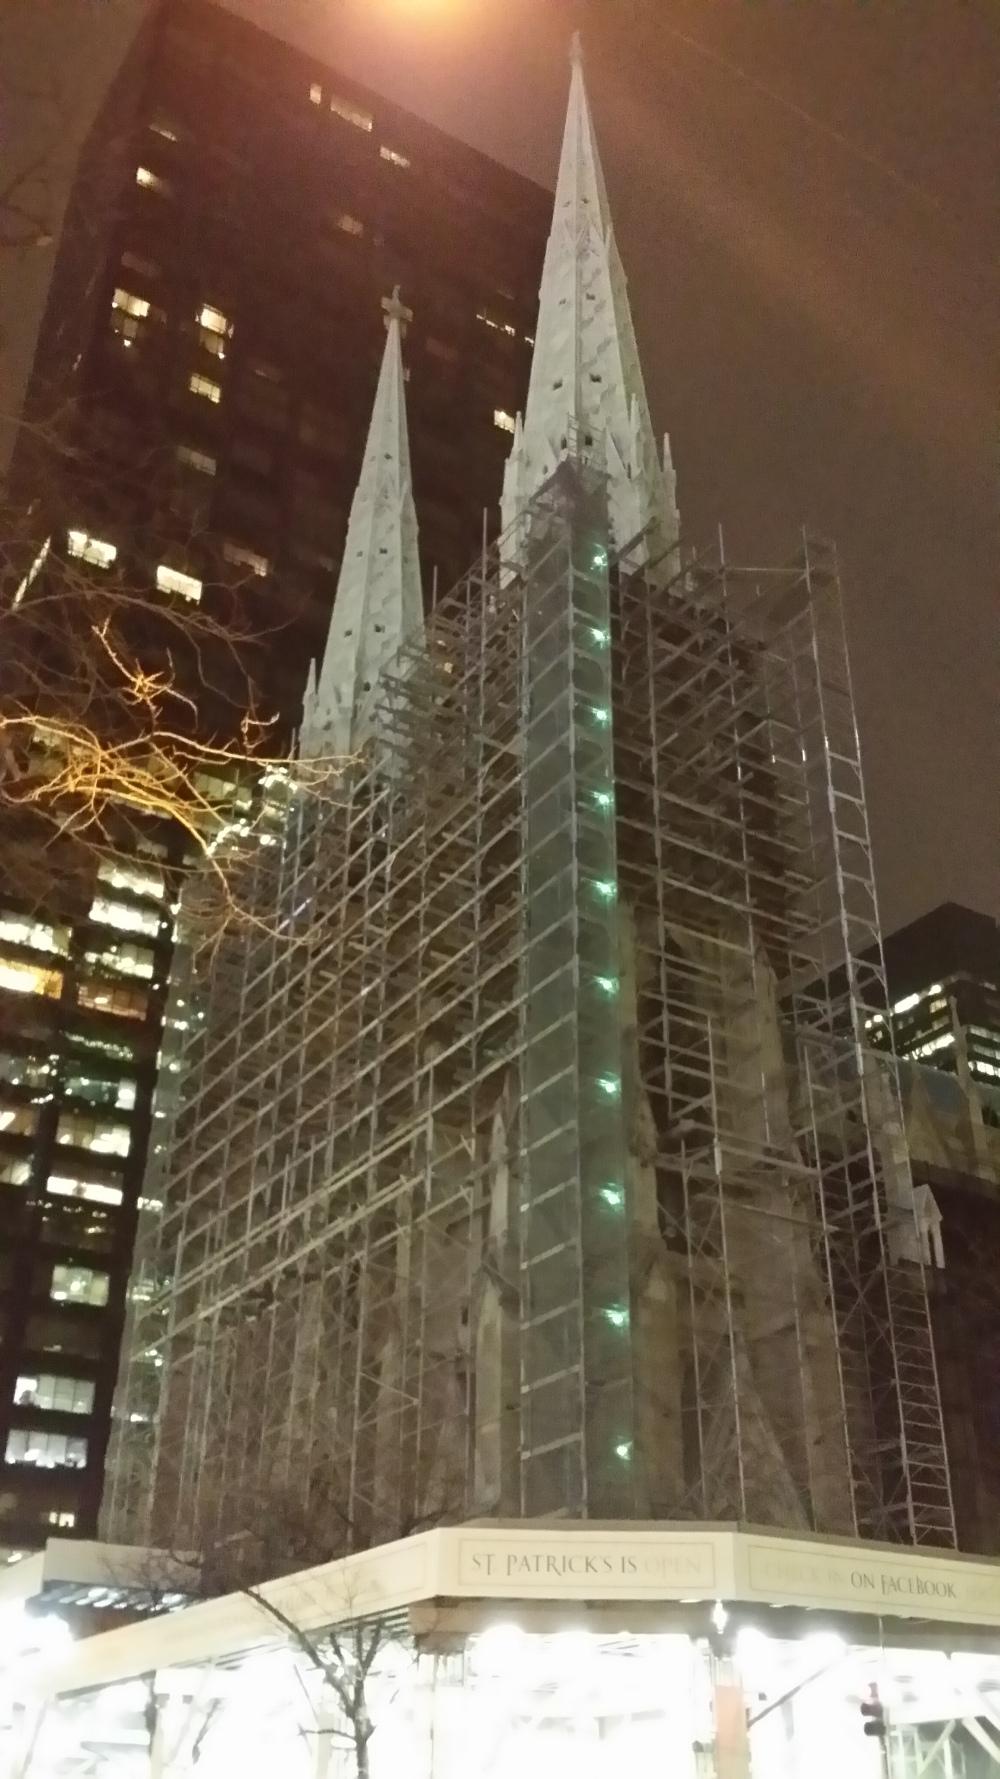 cathedral repairs